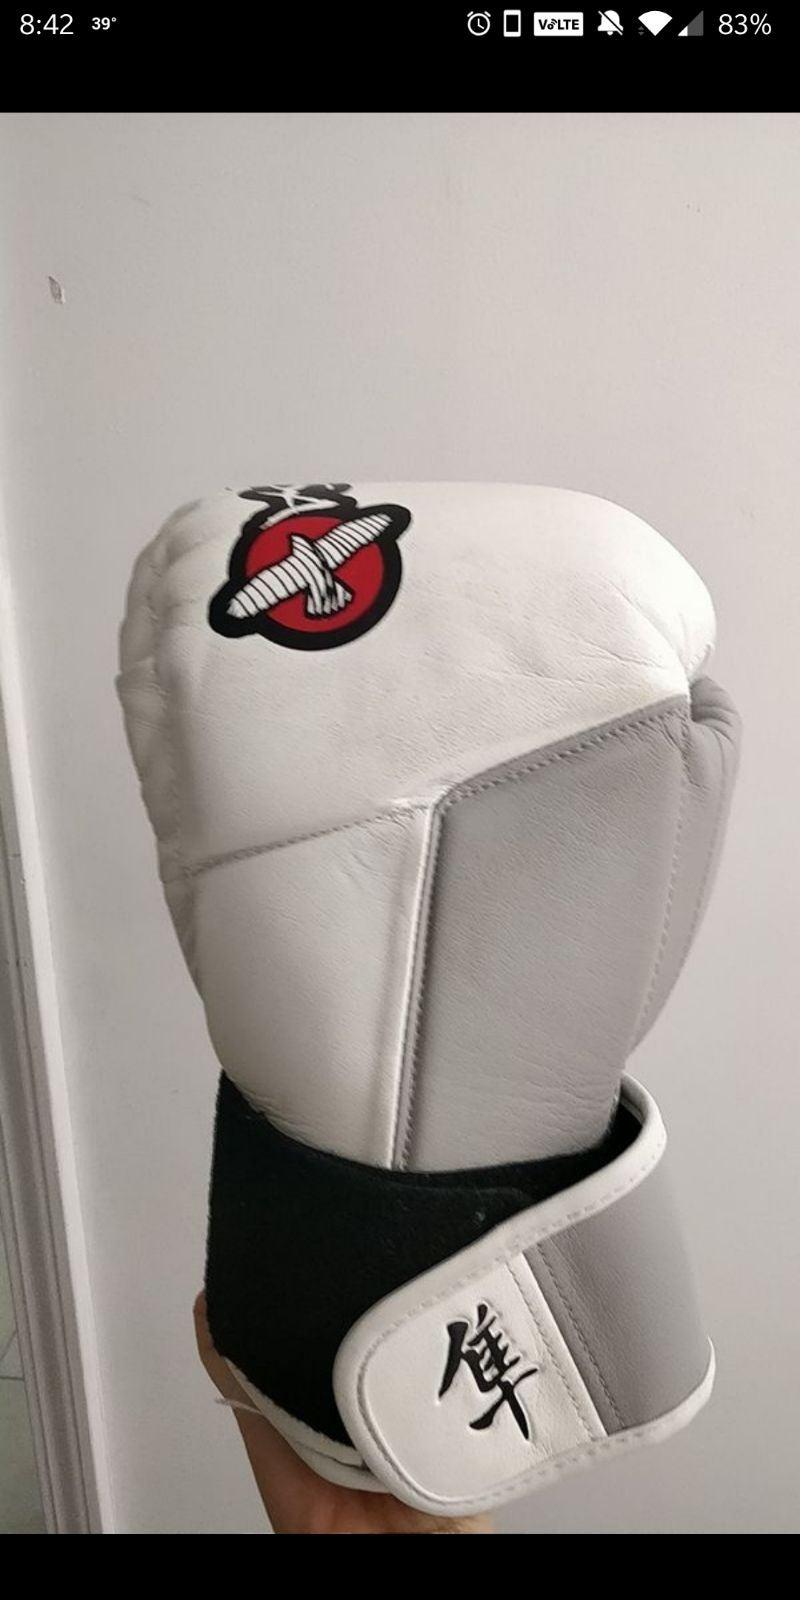 Hauabusa Glove